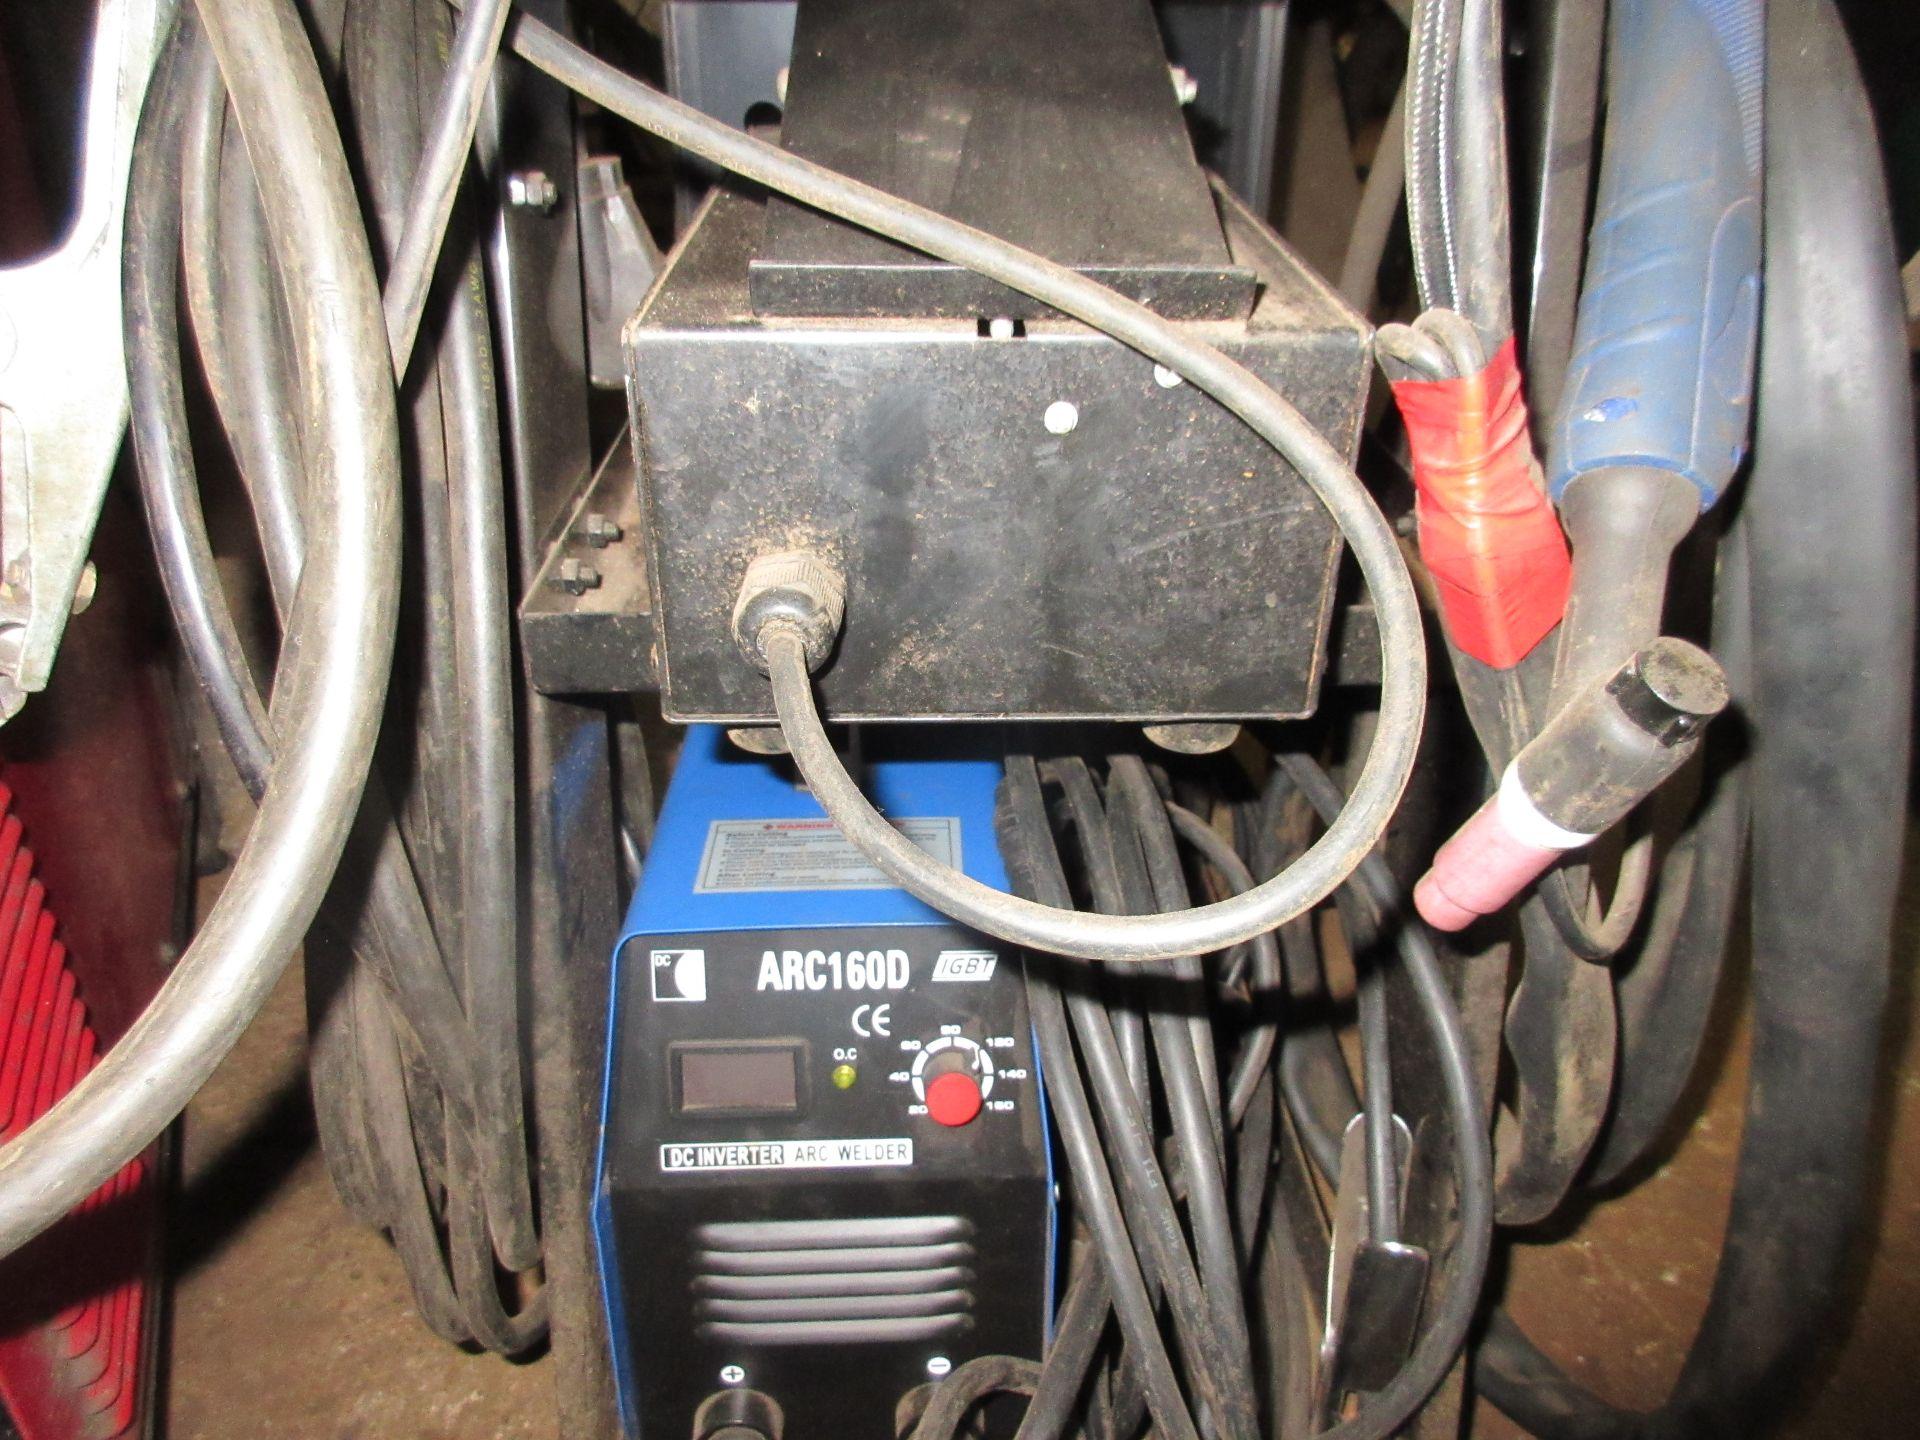 (1) IGBT Arc 160D Invertor Arc Welder w/ Chicago Electric Invertor Tig/Stick Welder, Foot Control - Image 3 of 5